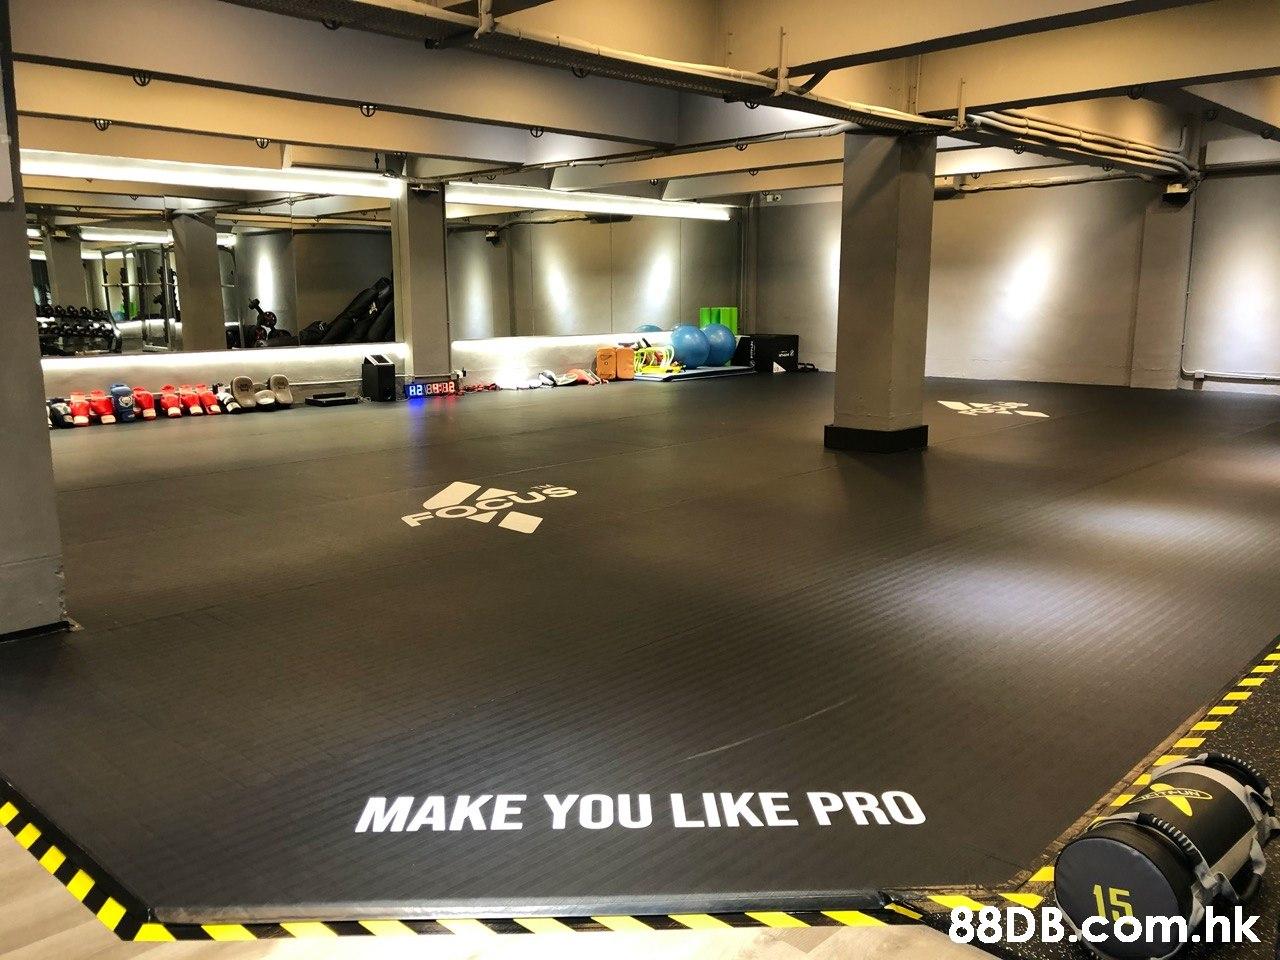 B288:82 MAKE YOU LIKE PRO .hk  Floor,Parking lot,Flooring,Parking,Room